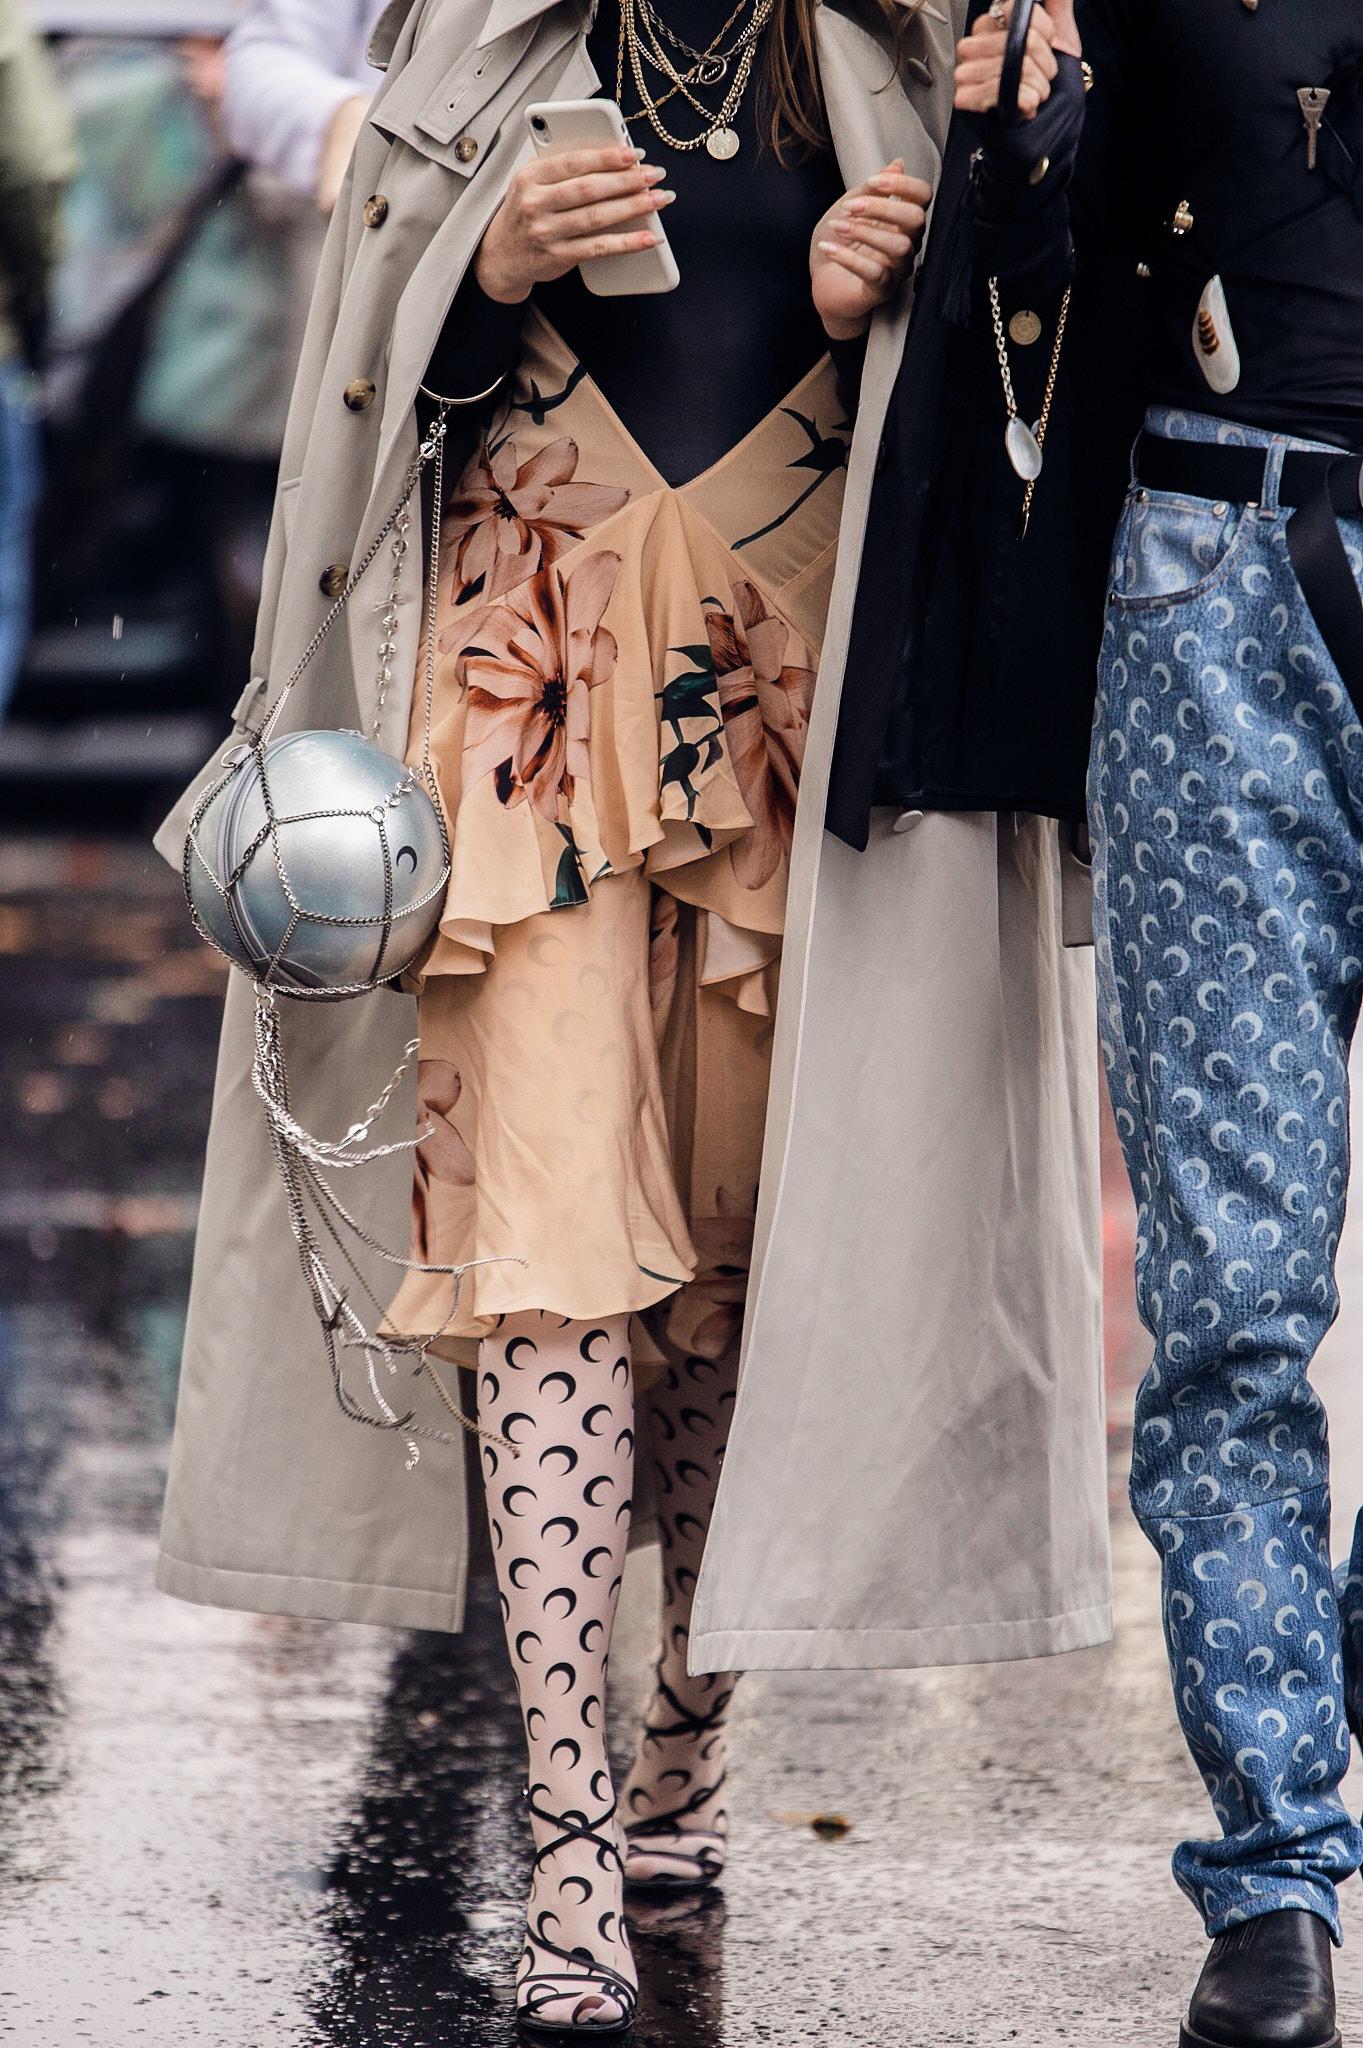 On the street - Paris Fashion Week SS20